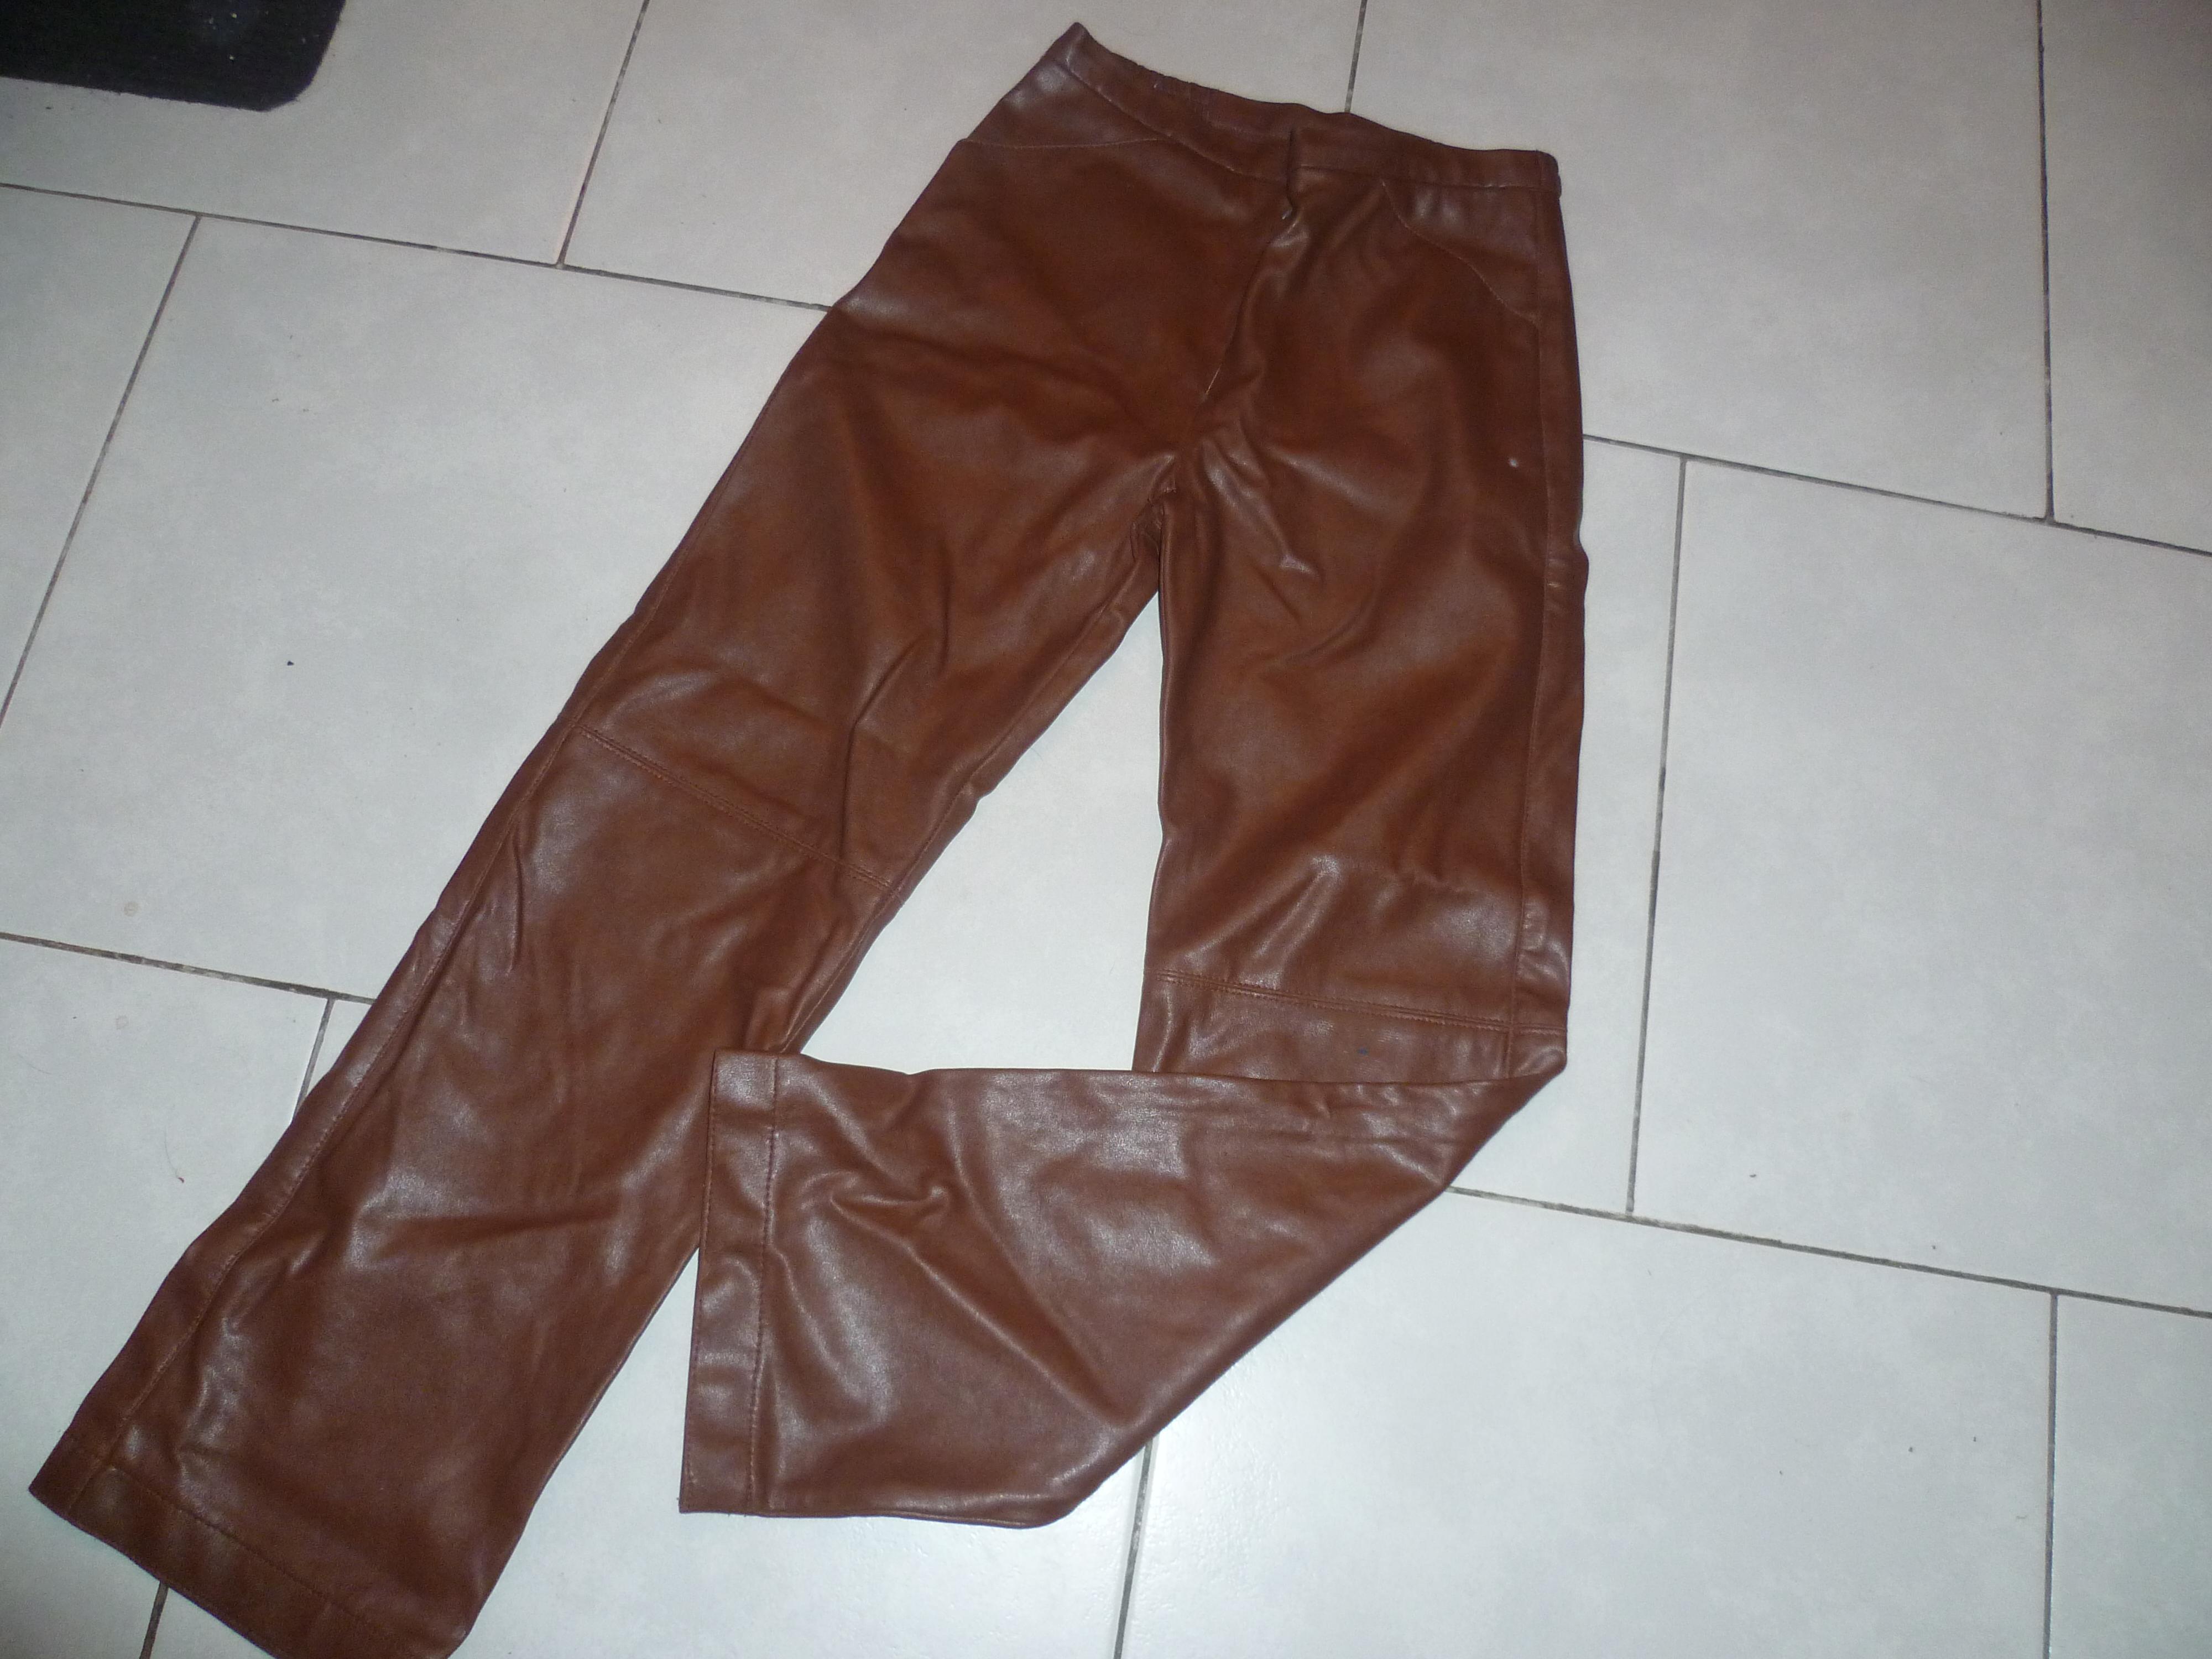 troc de troc pantalon cfk - simili marron image 0